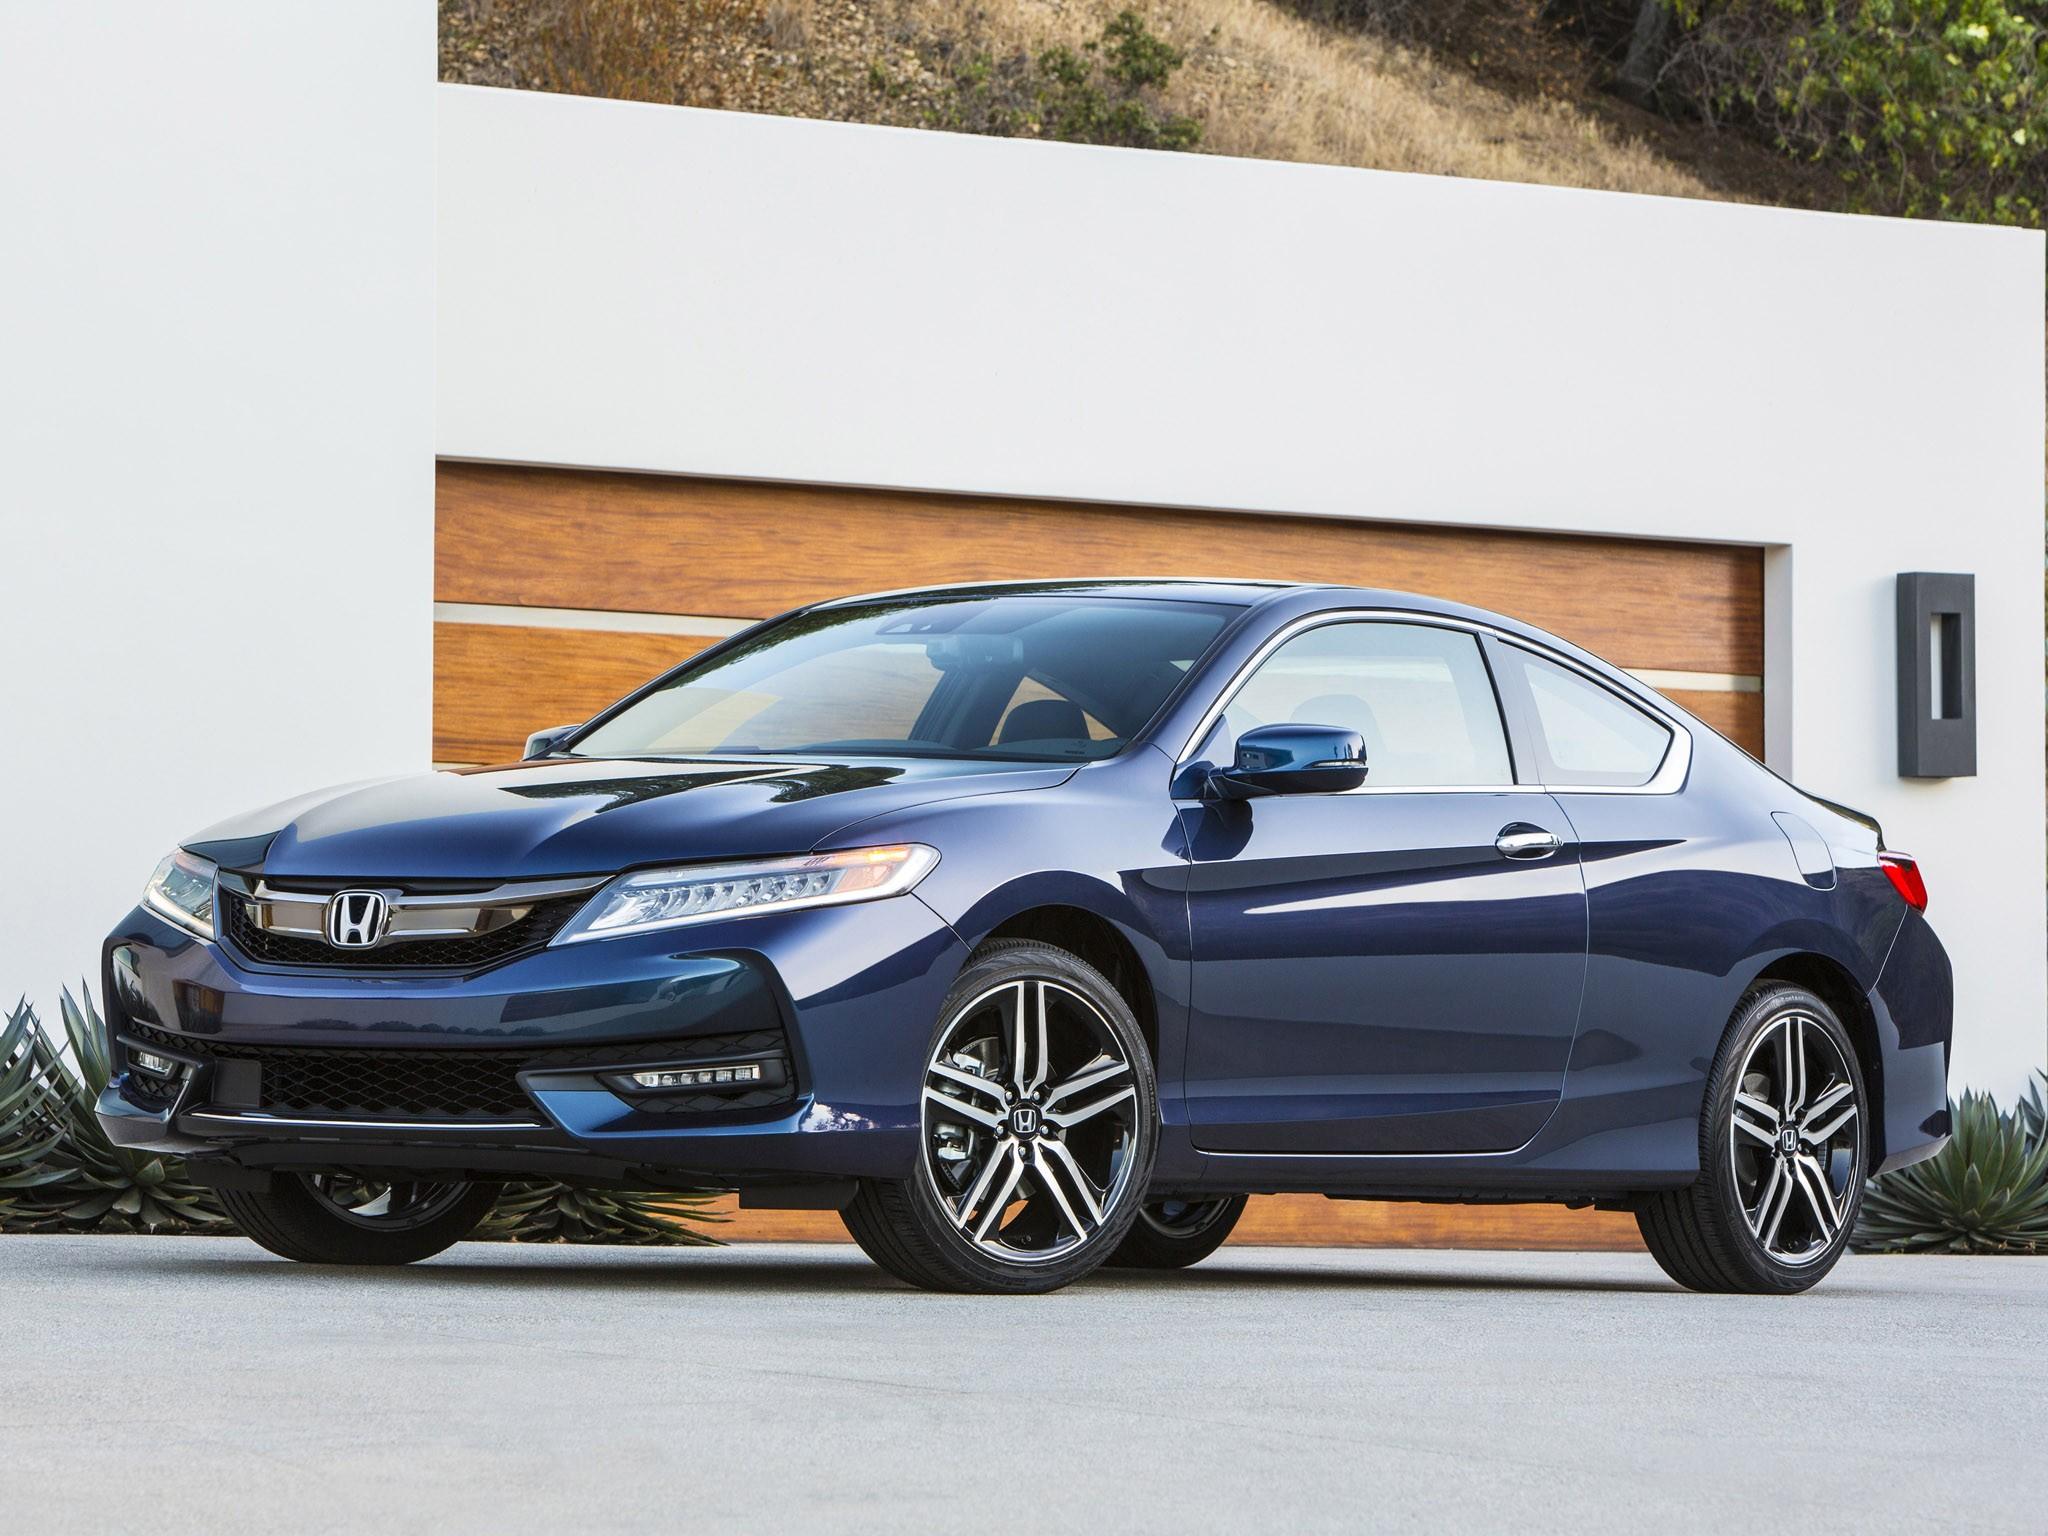 2015 Honda Accord Touring Coupe